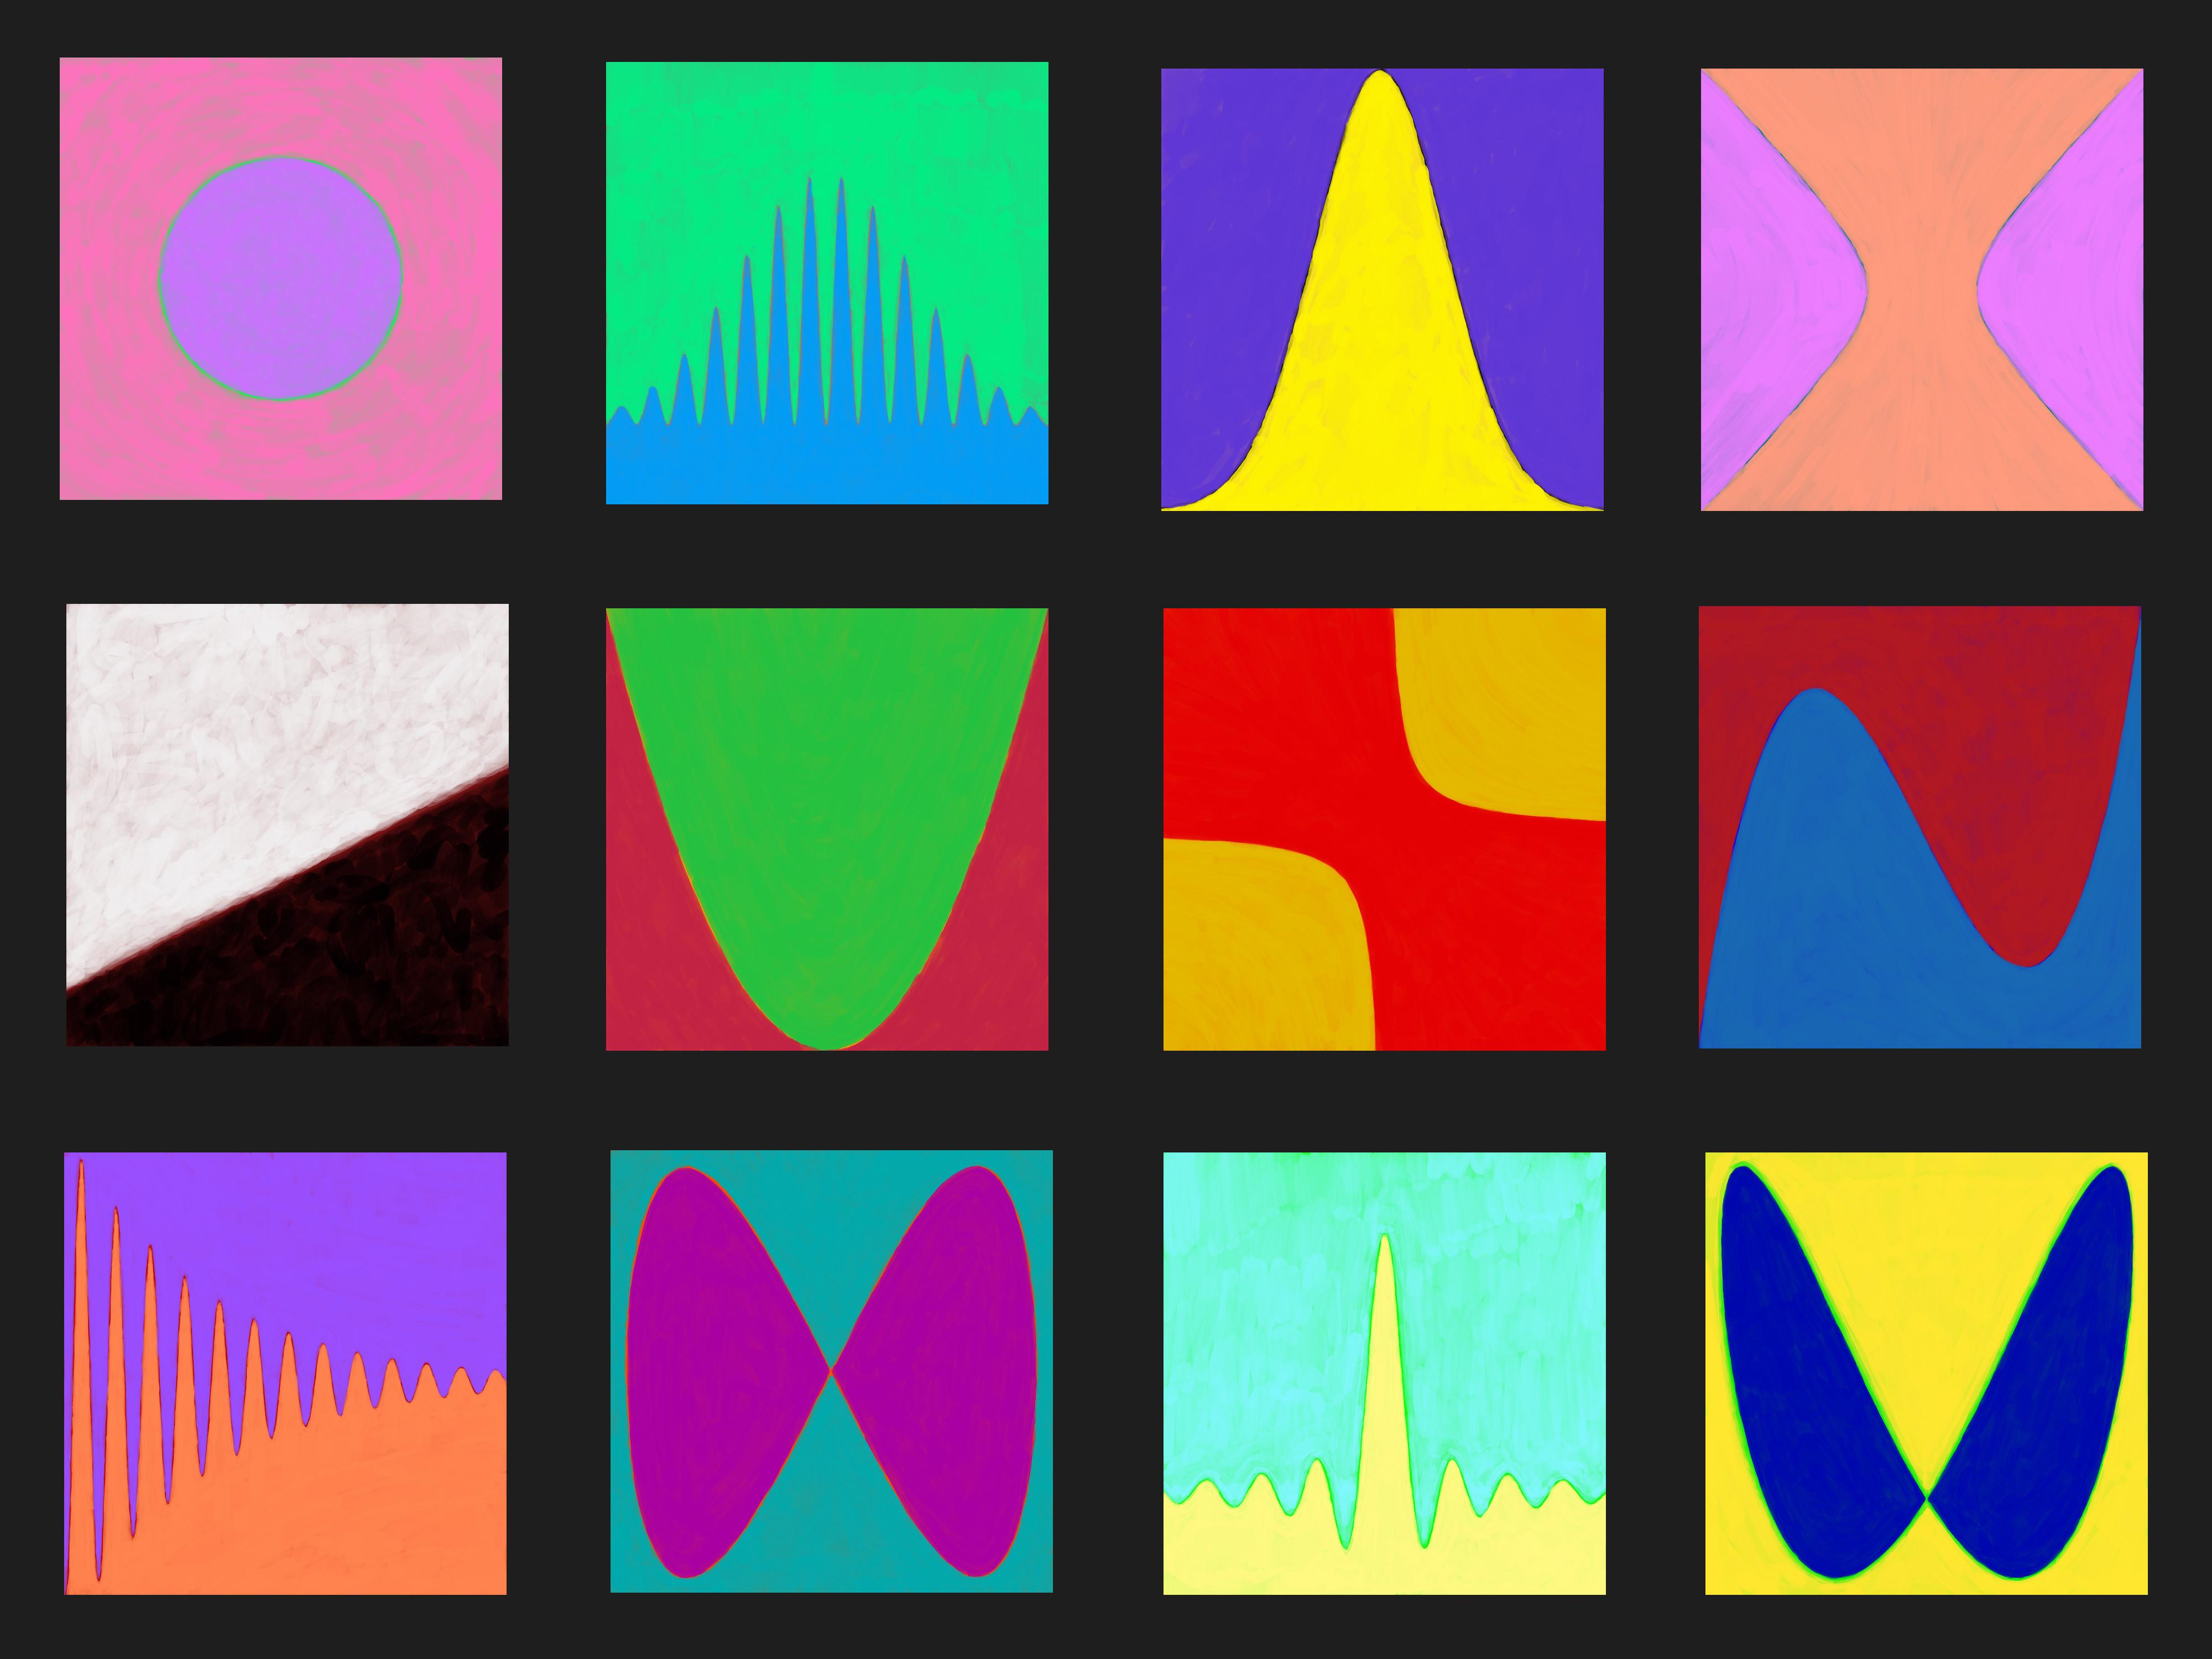 math-art-composition-12-painting